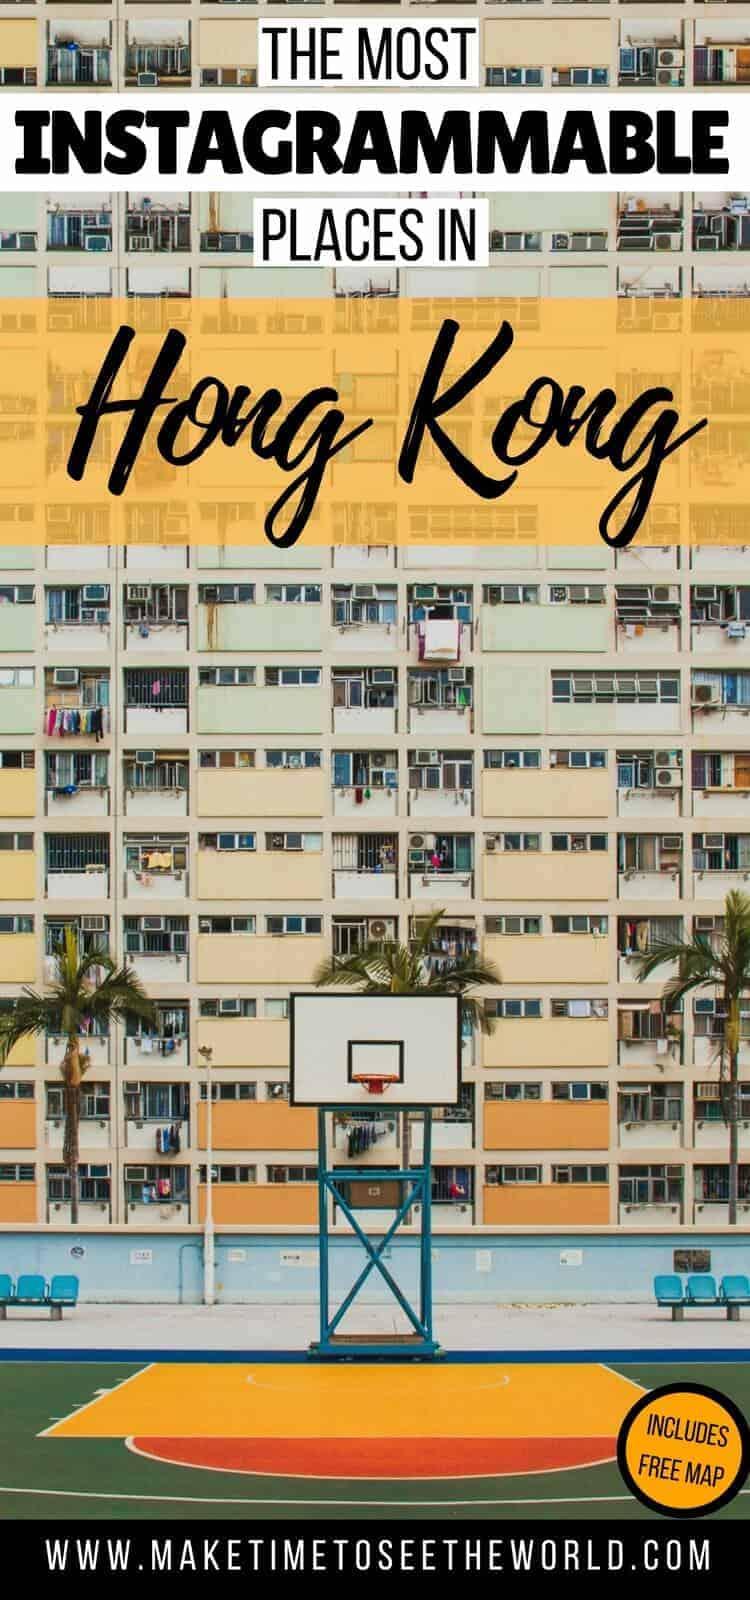 Instagram Spots in Hong Kong